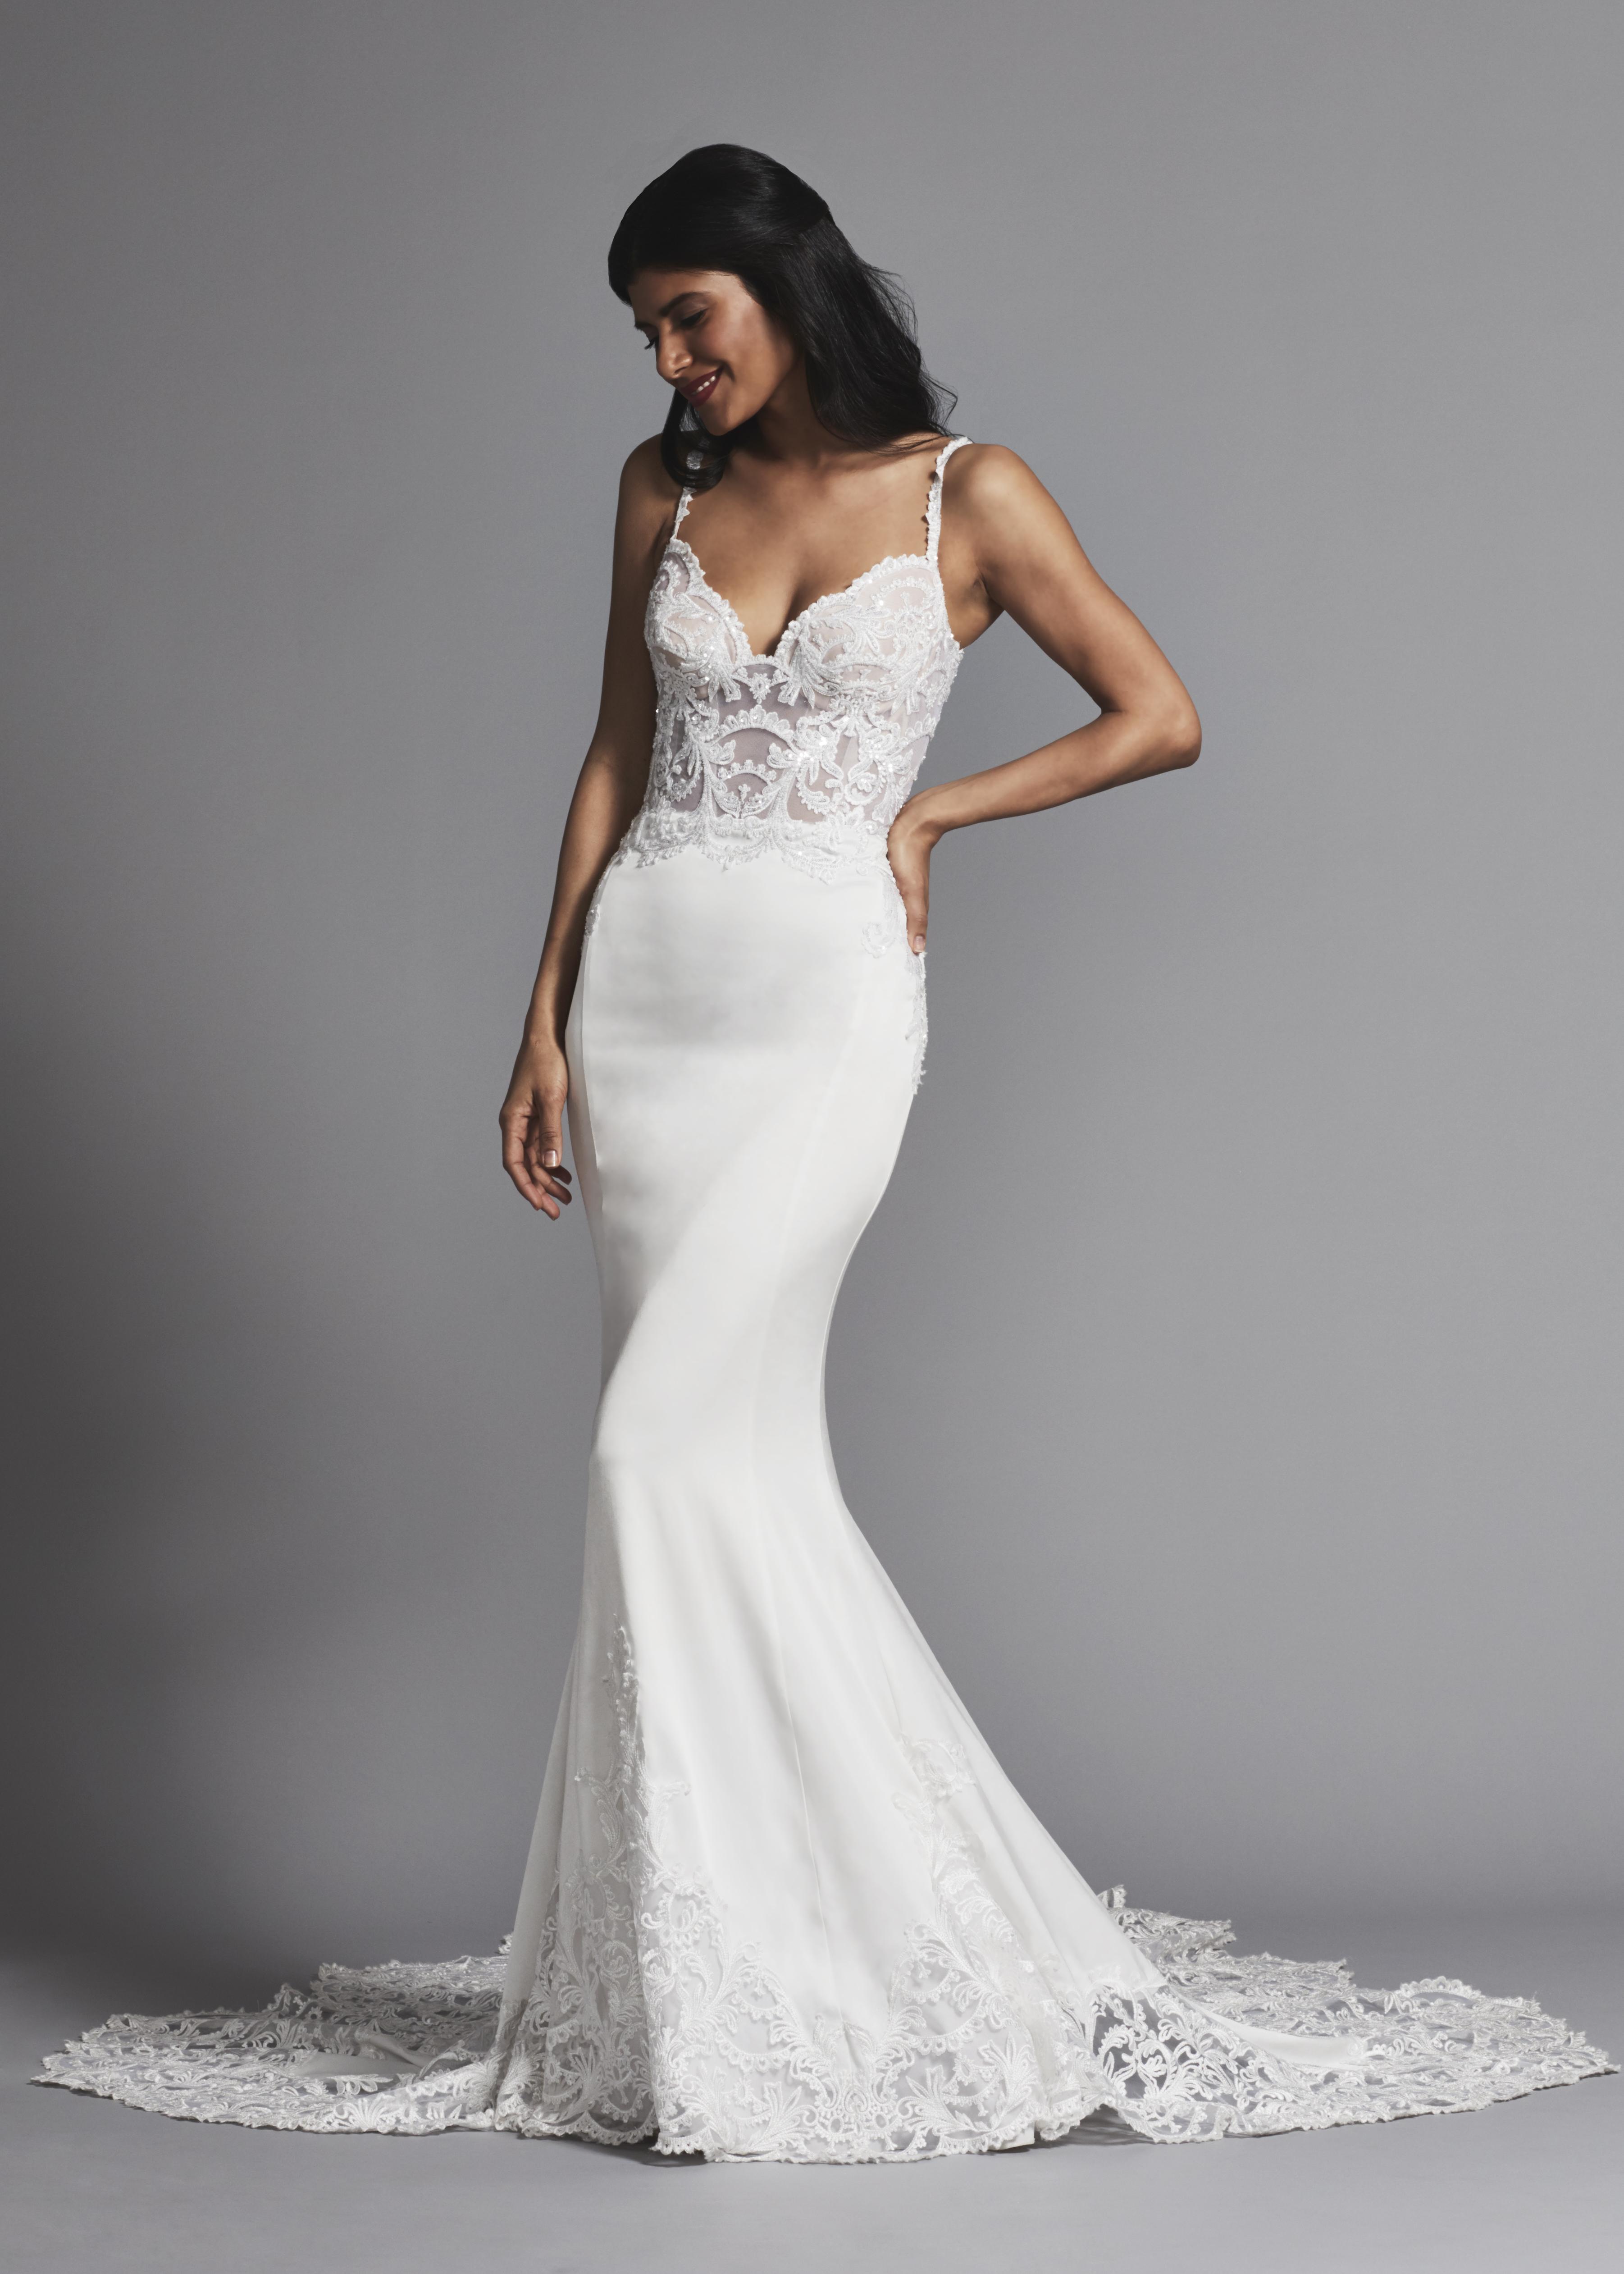 Spaghetti Strap Beaded Sheer Bodice Sheath Wedding Dress | Kleinfeld ...